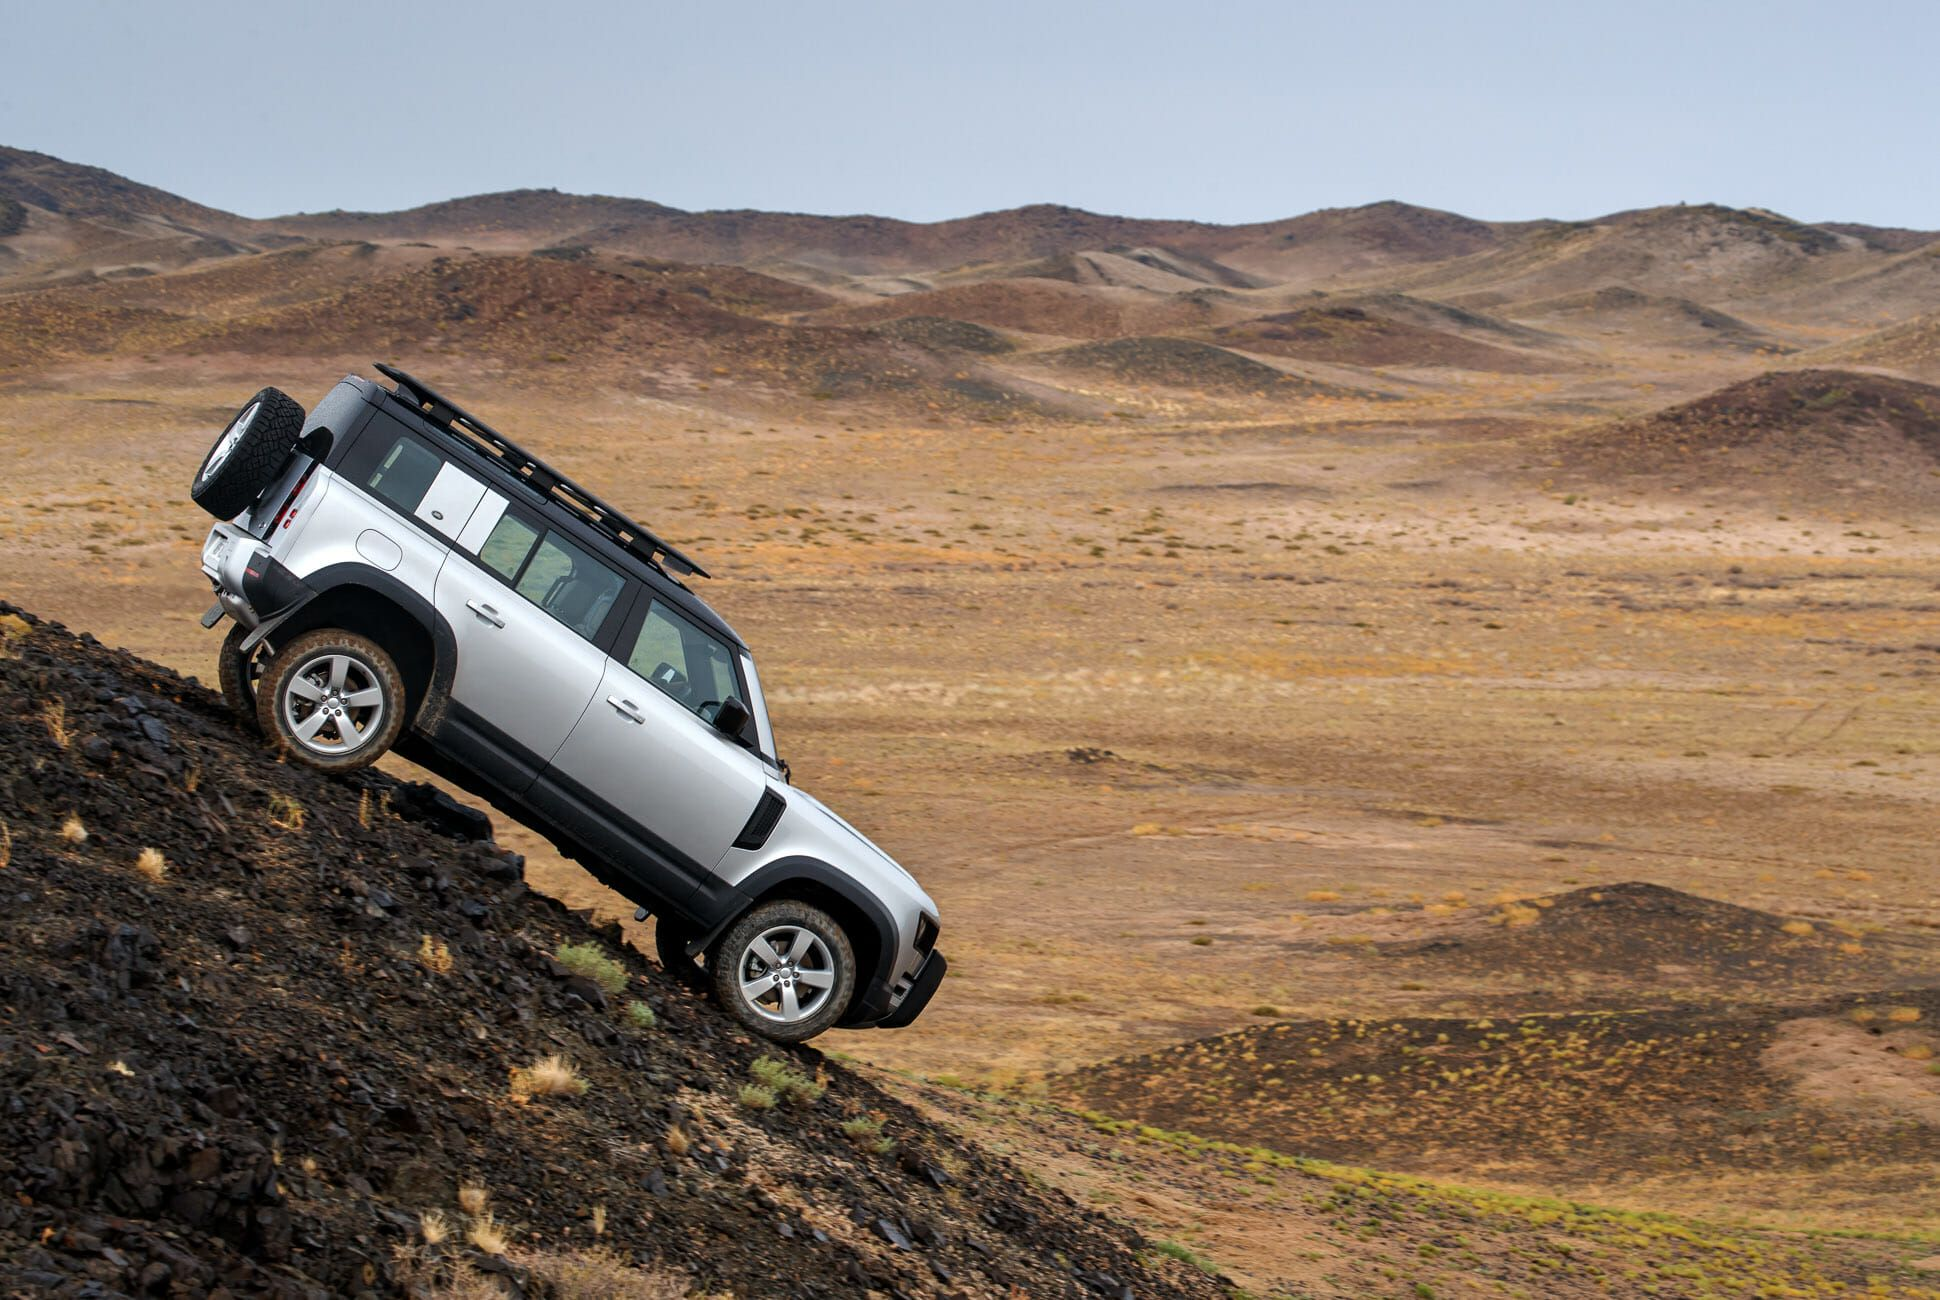 Land Rover Defender Gear Patrol-Exterior Action-Slide-19